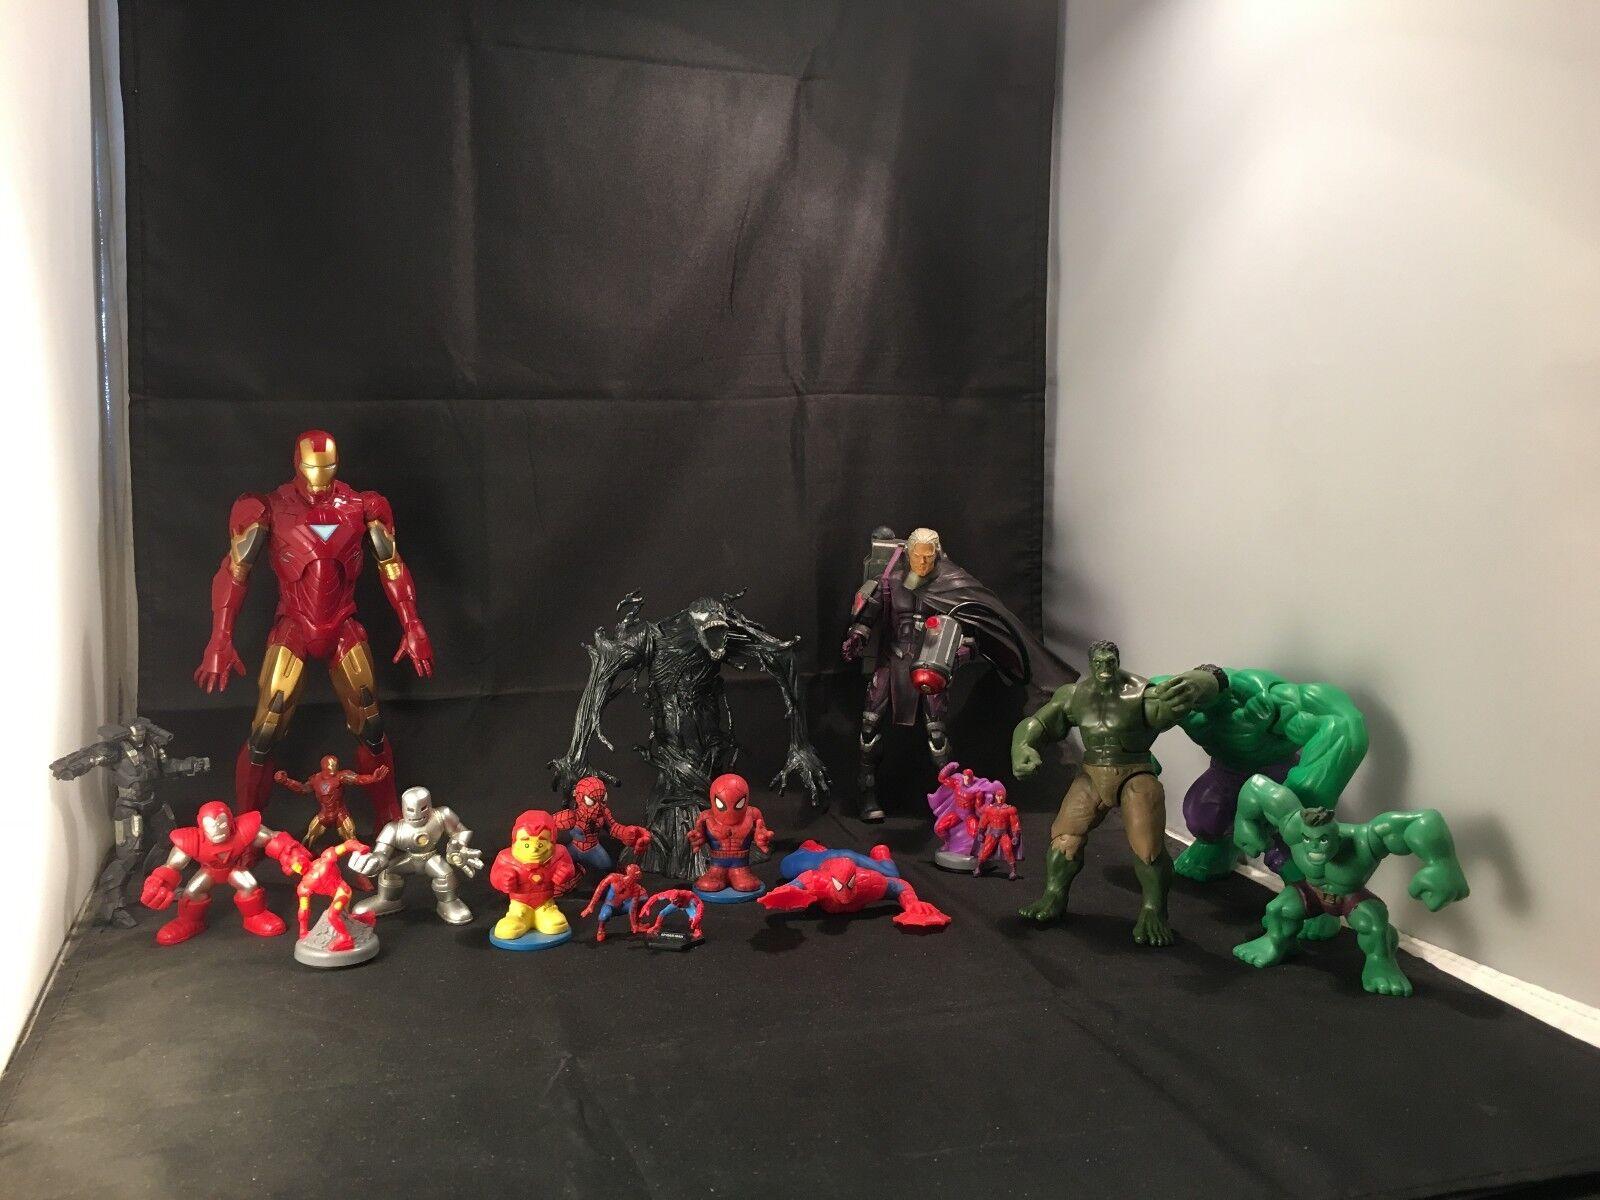 Marvel – Spiderman   Hulk   Iron Man   Magneto -19 Pieces Collectables Toys Set